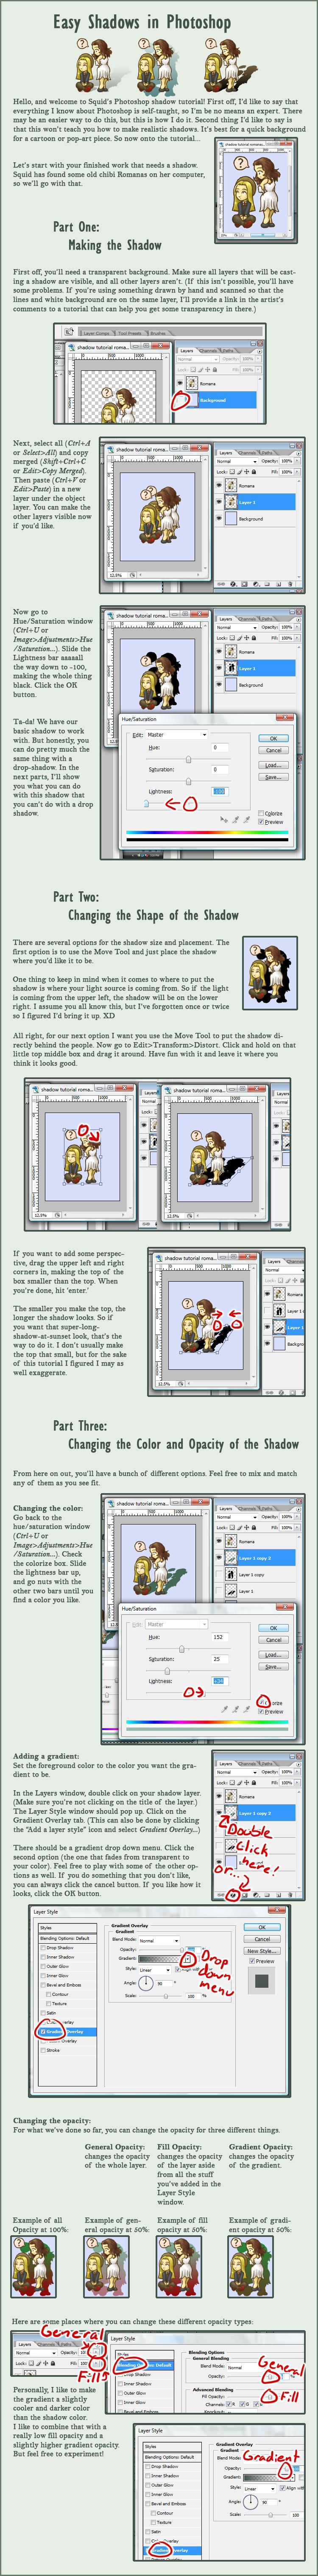 Easy Shadows in Photoshop by squidlarkin